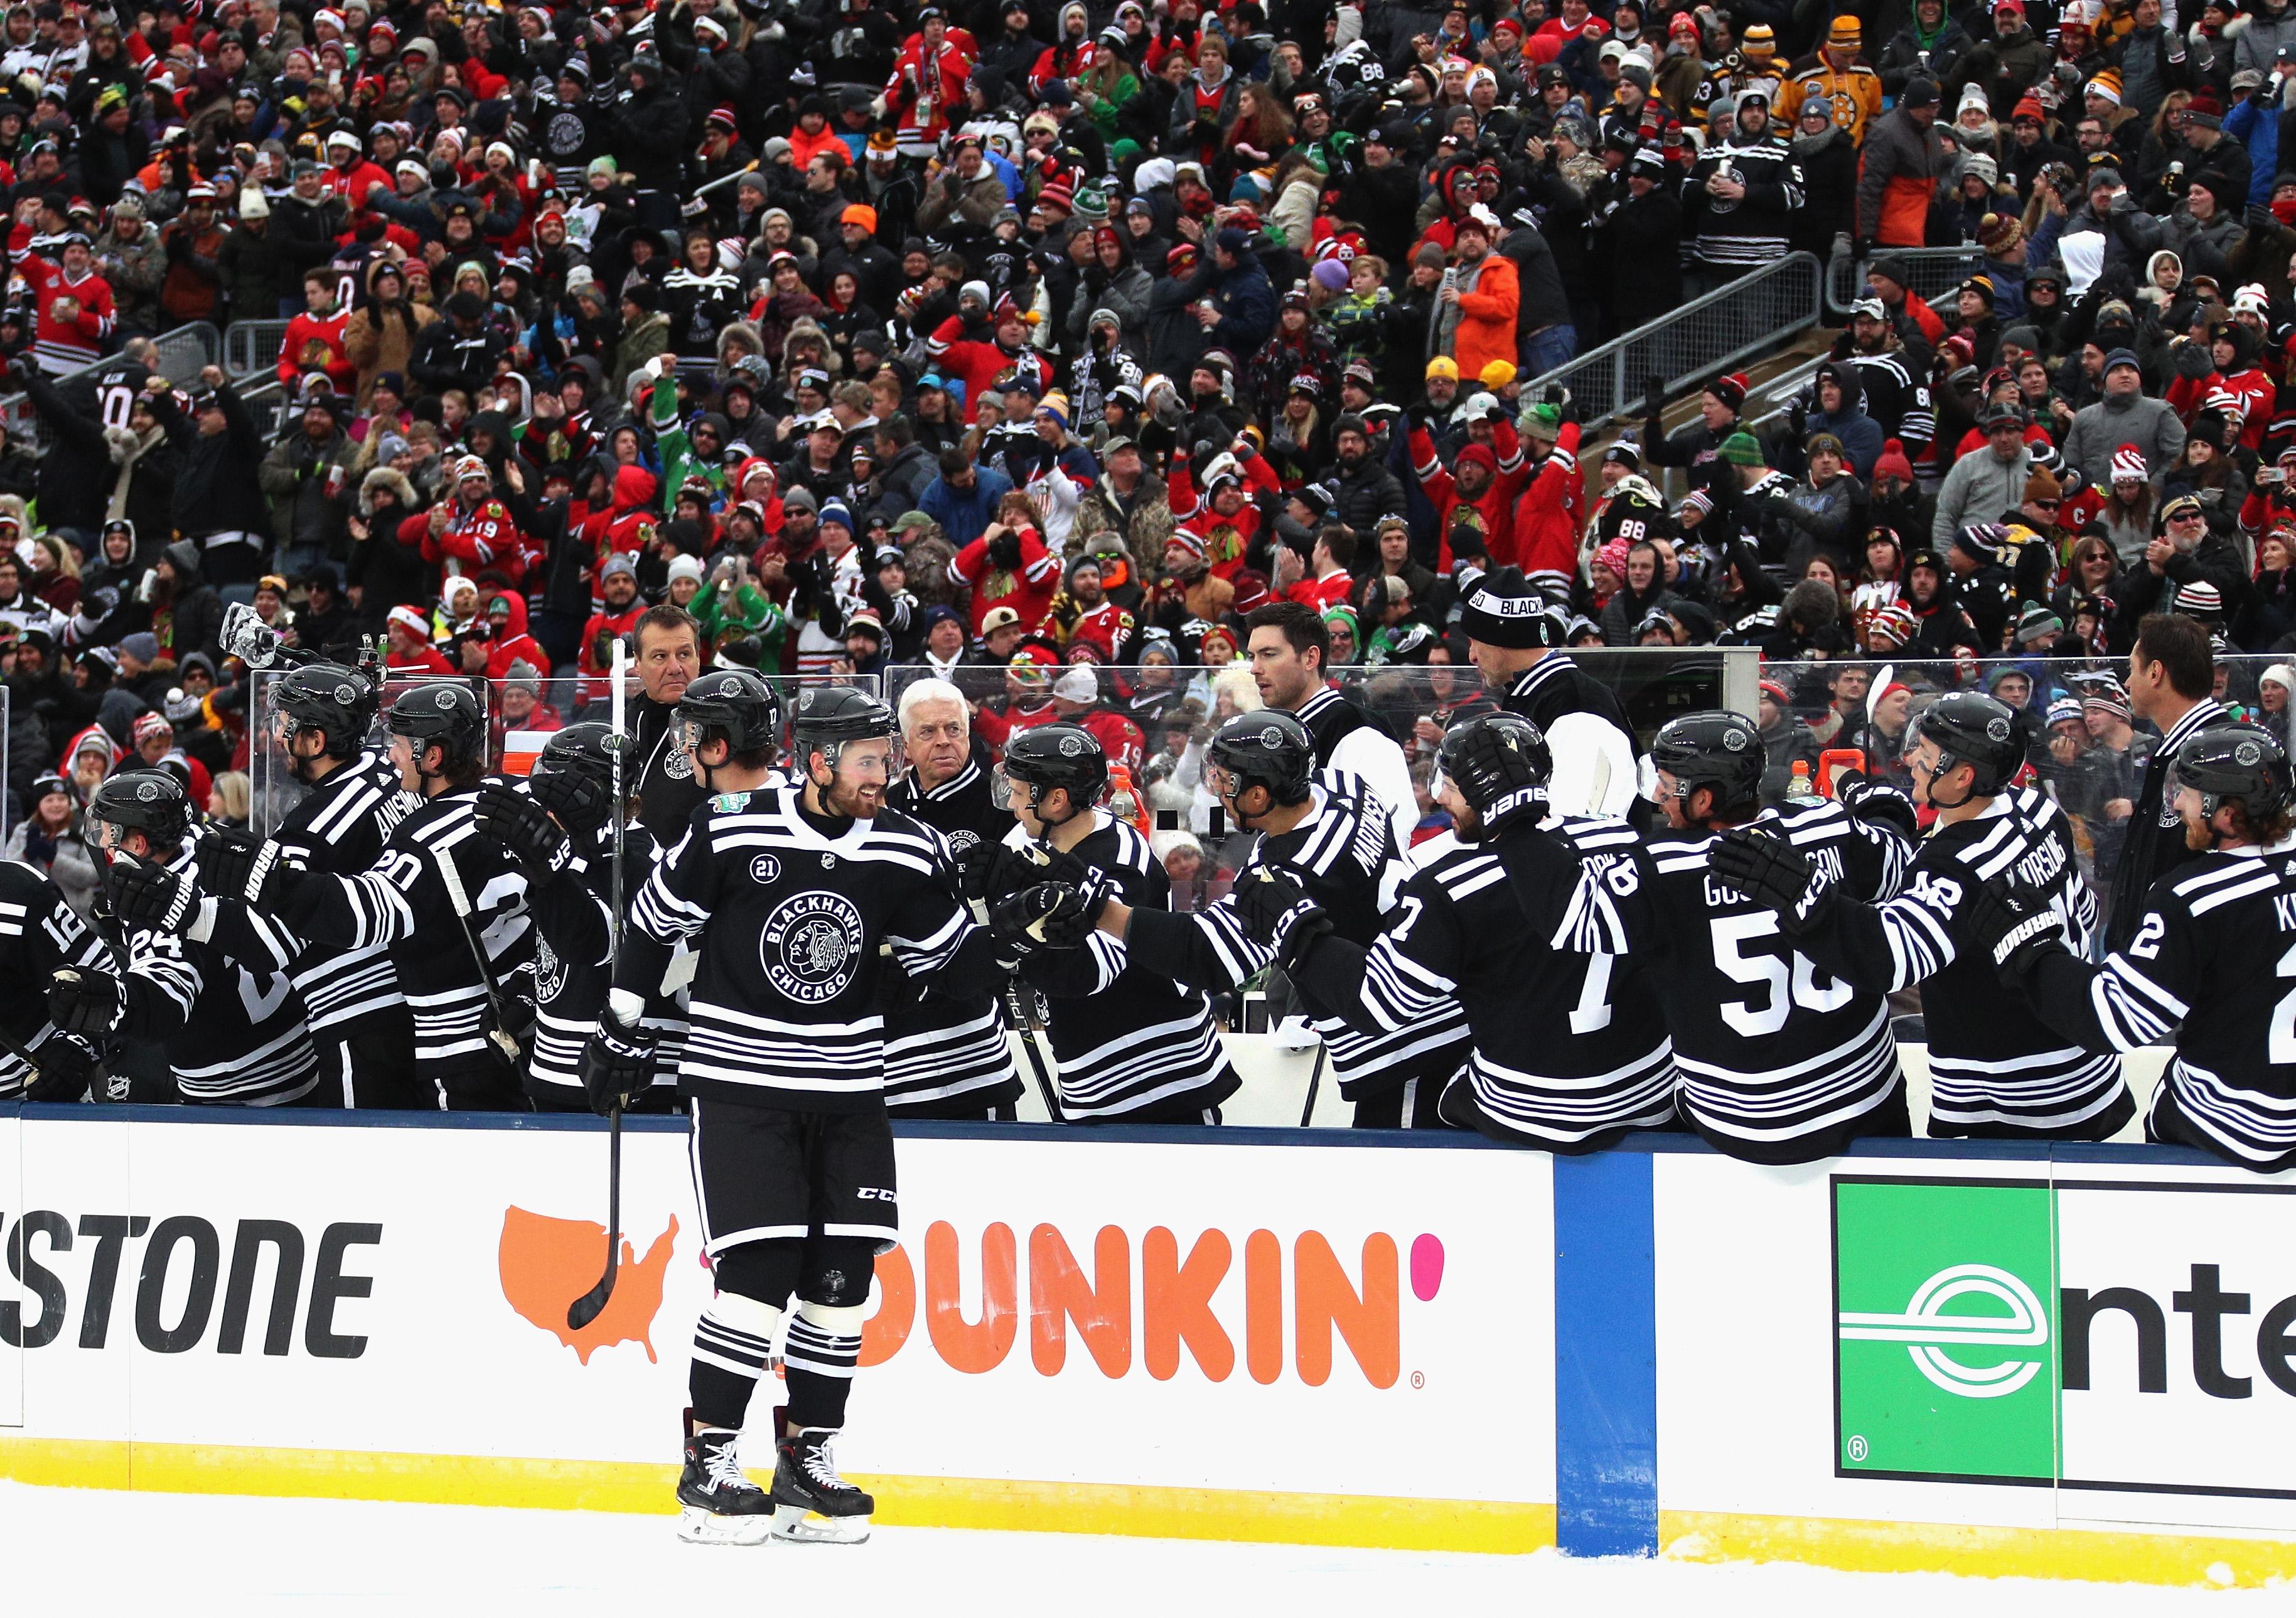 814752789 2019 Bridgestone NHL Winter Classic - Boston Bruins v Chicago Blackhawks